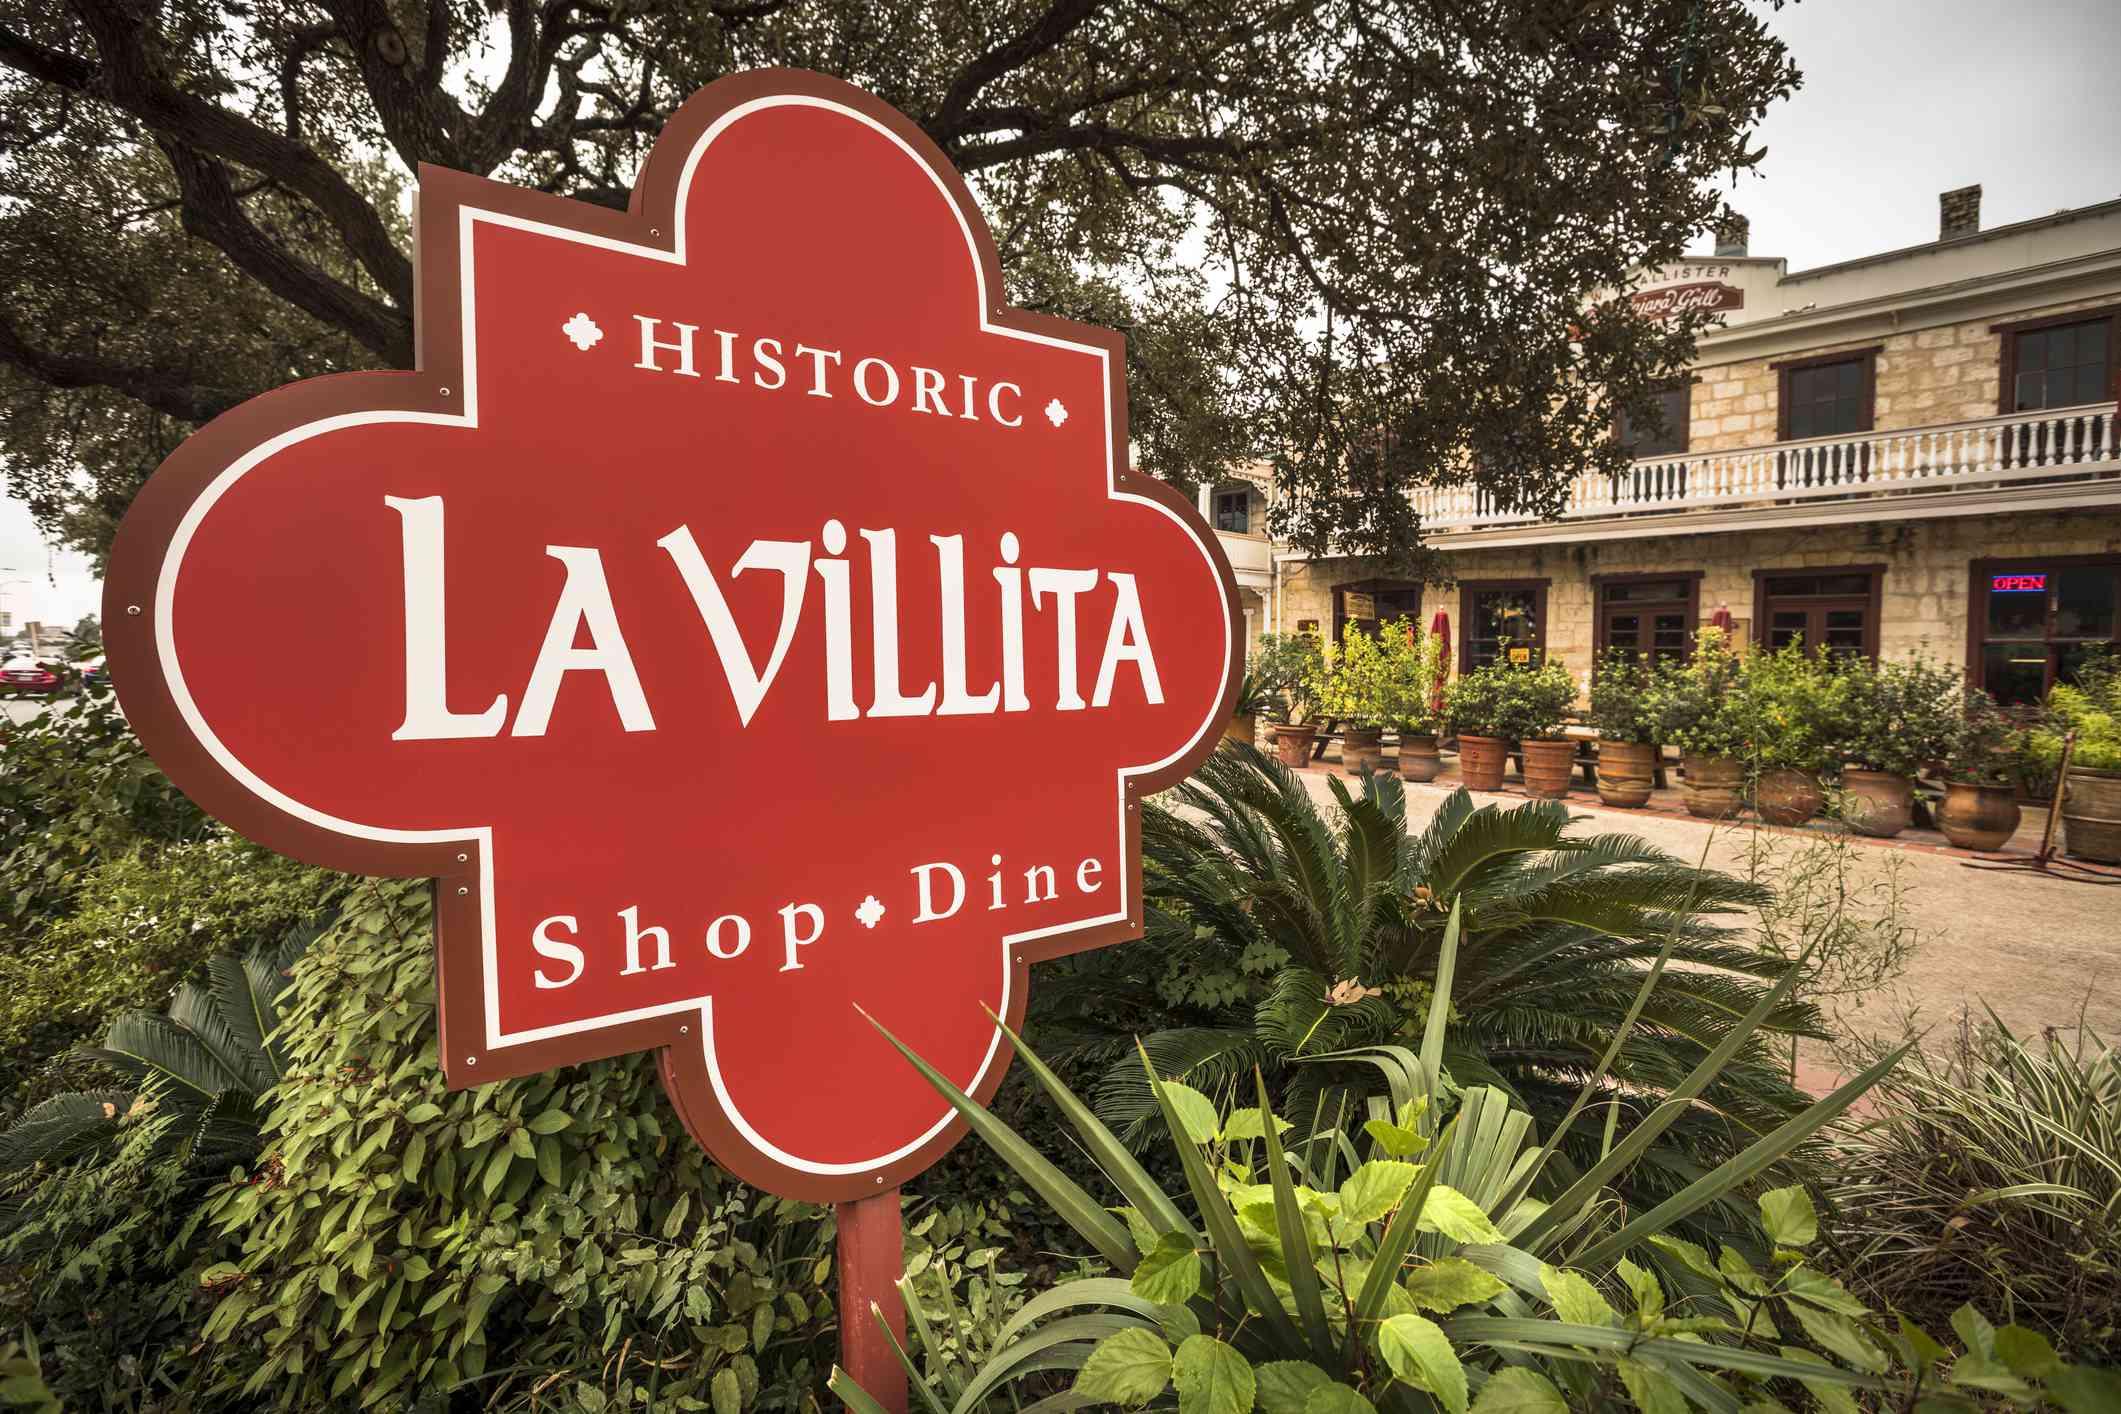 La Villita historic district in San Antonio